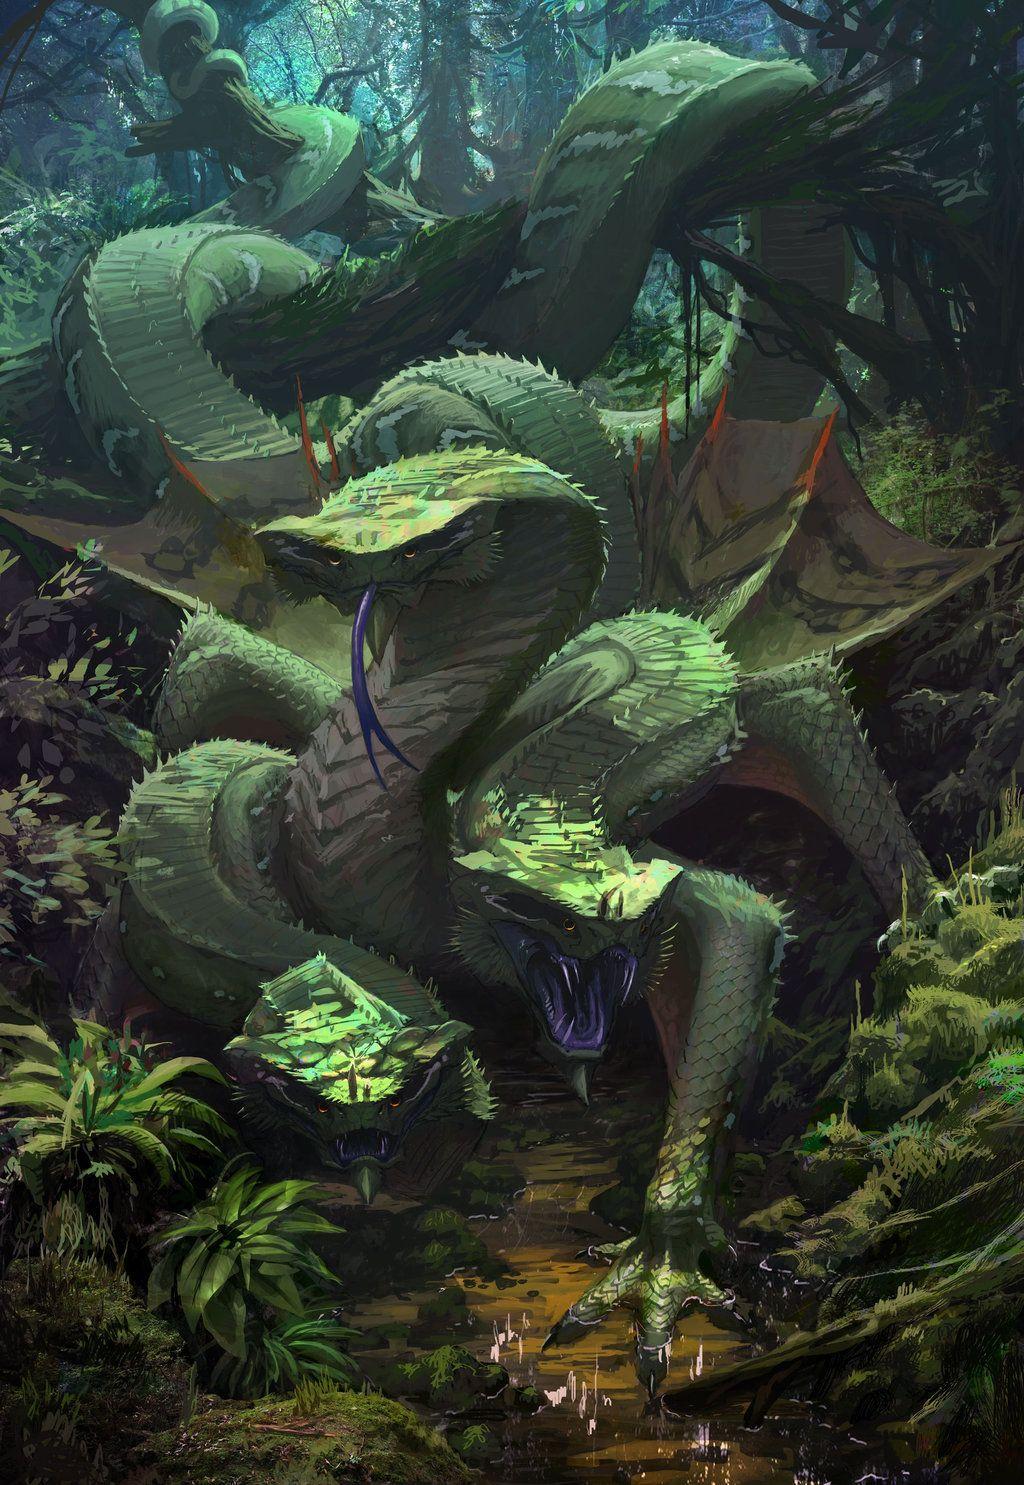 Green-dragon by mobius-9.deviantart.com on @DeviantArt